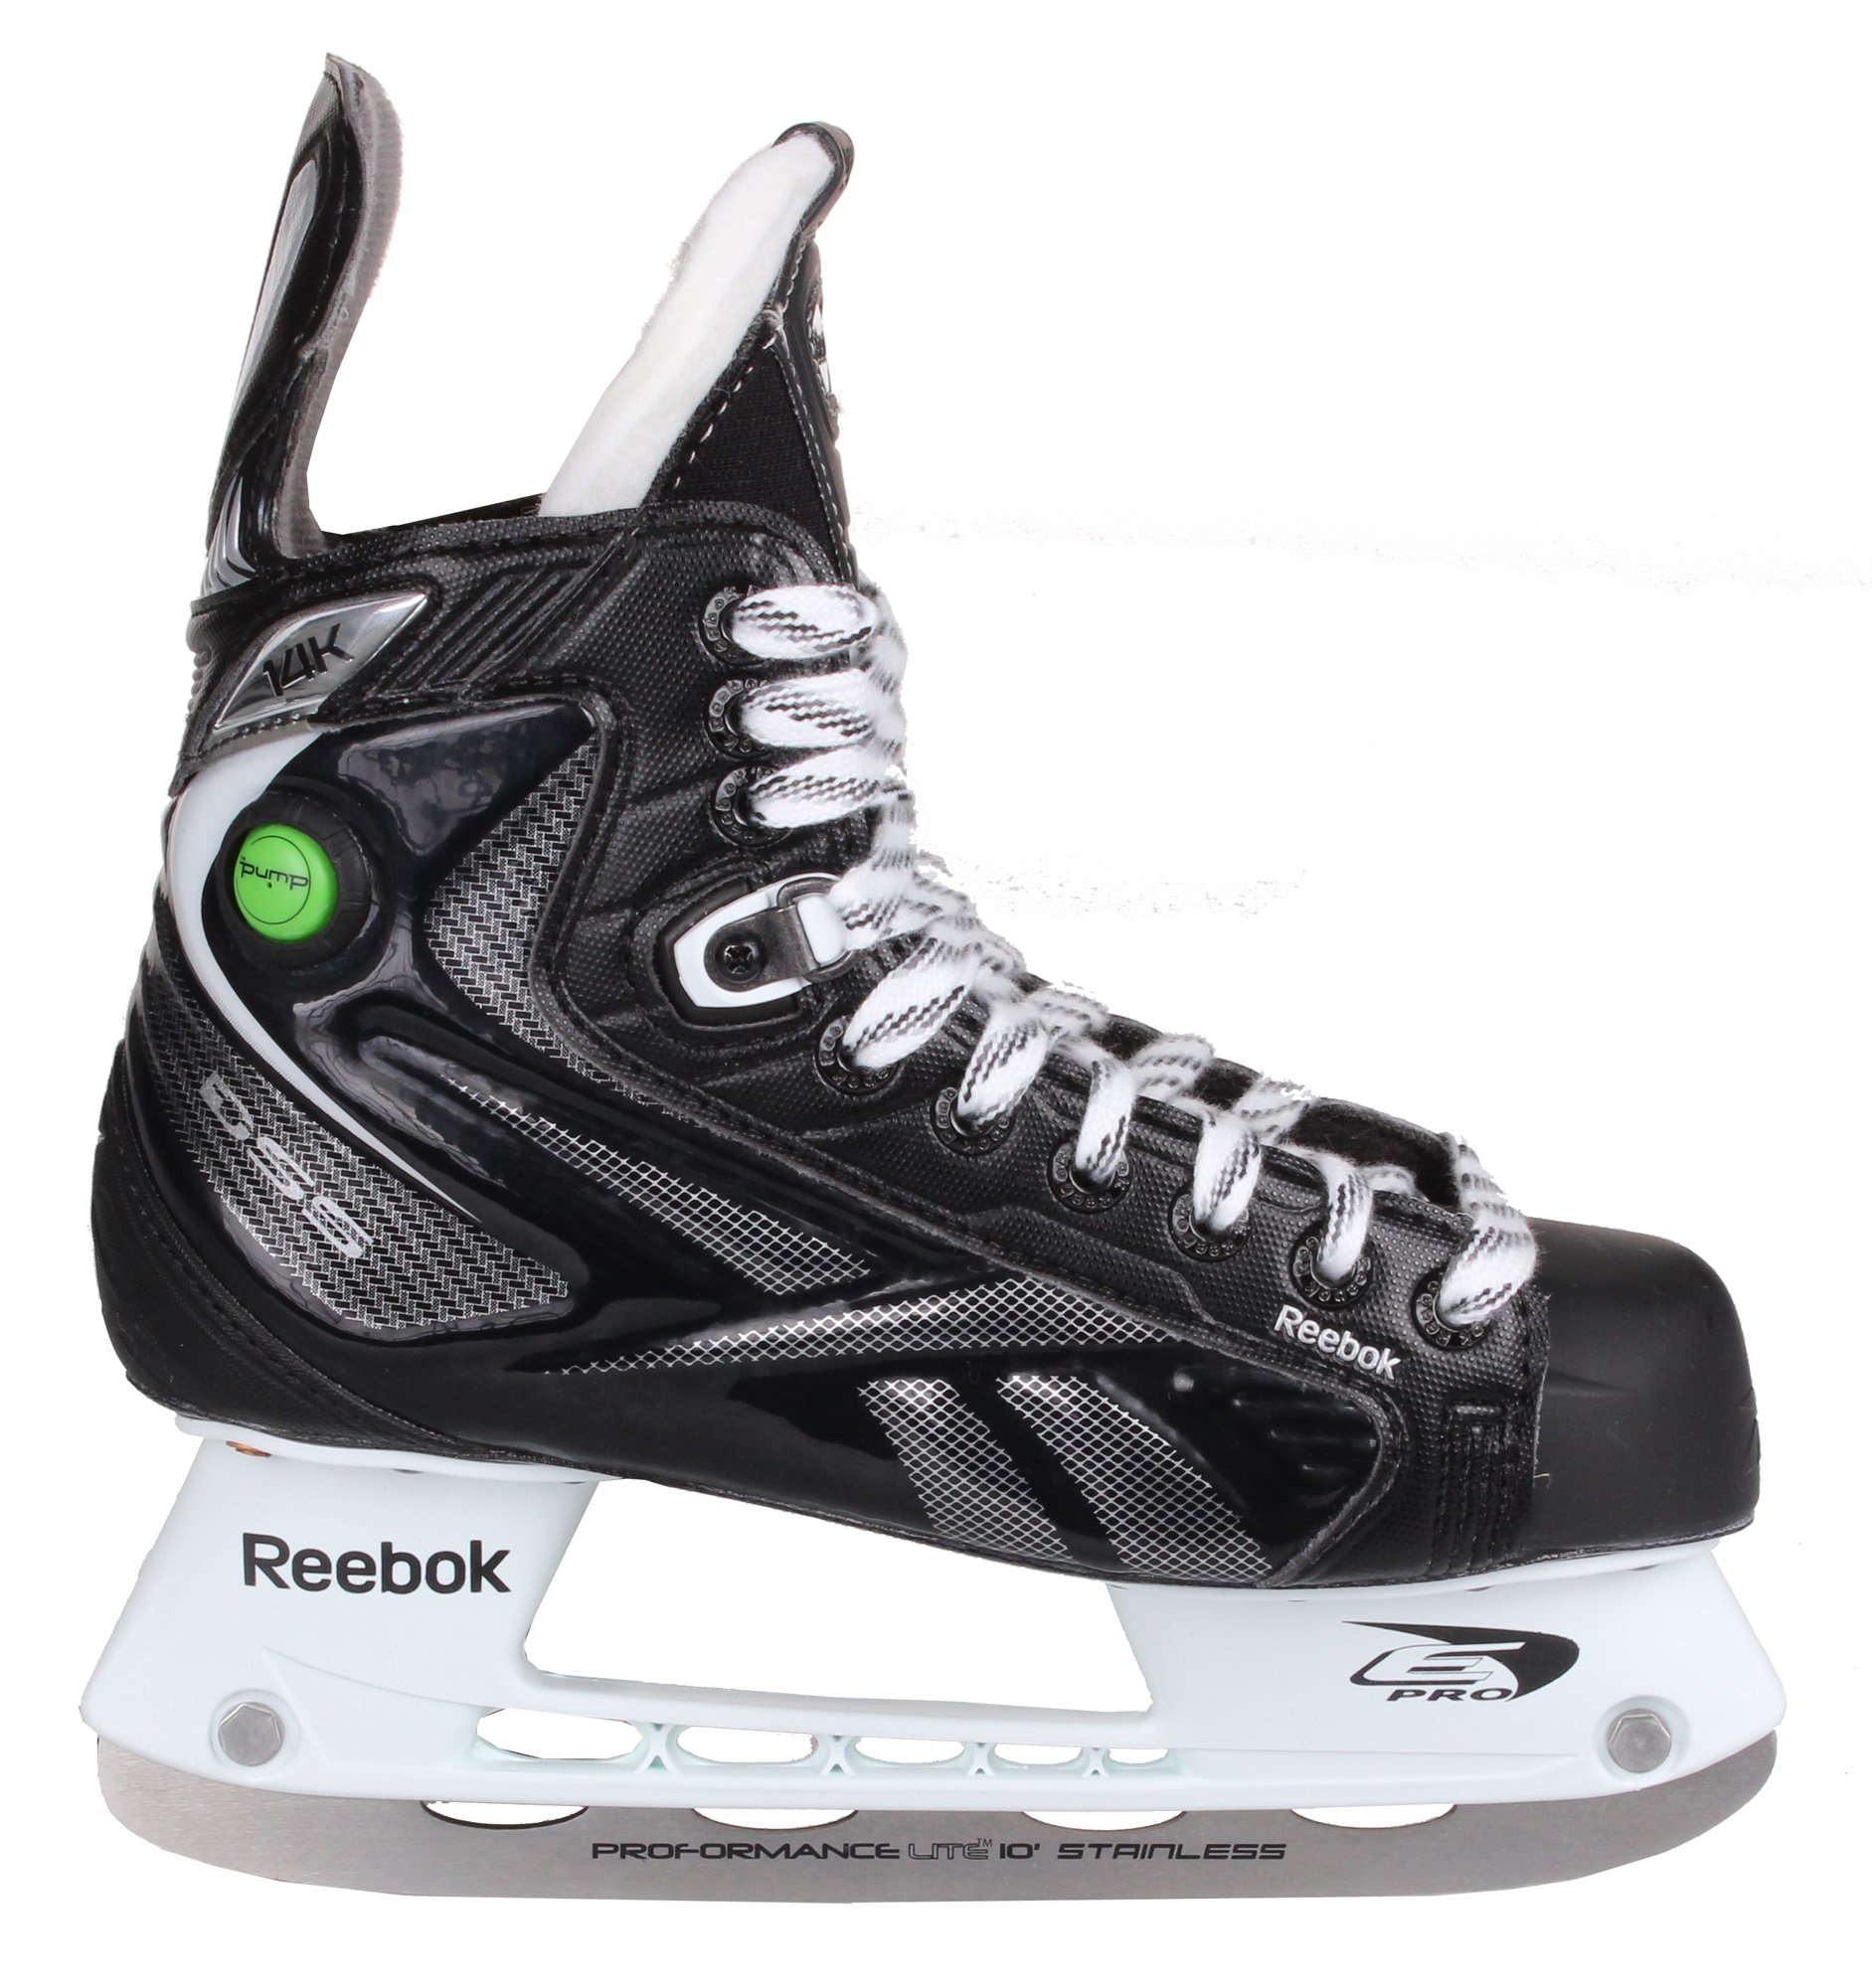 REEBOK 14K Pump, JR hokejové brusle, šíře D